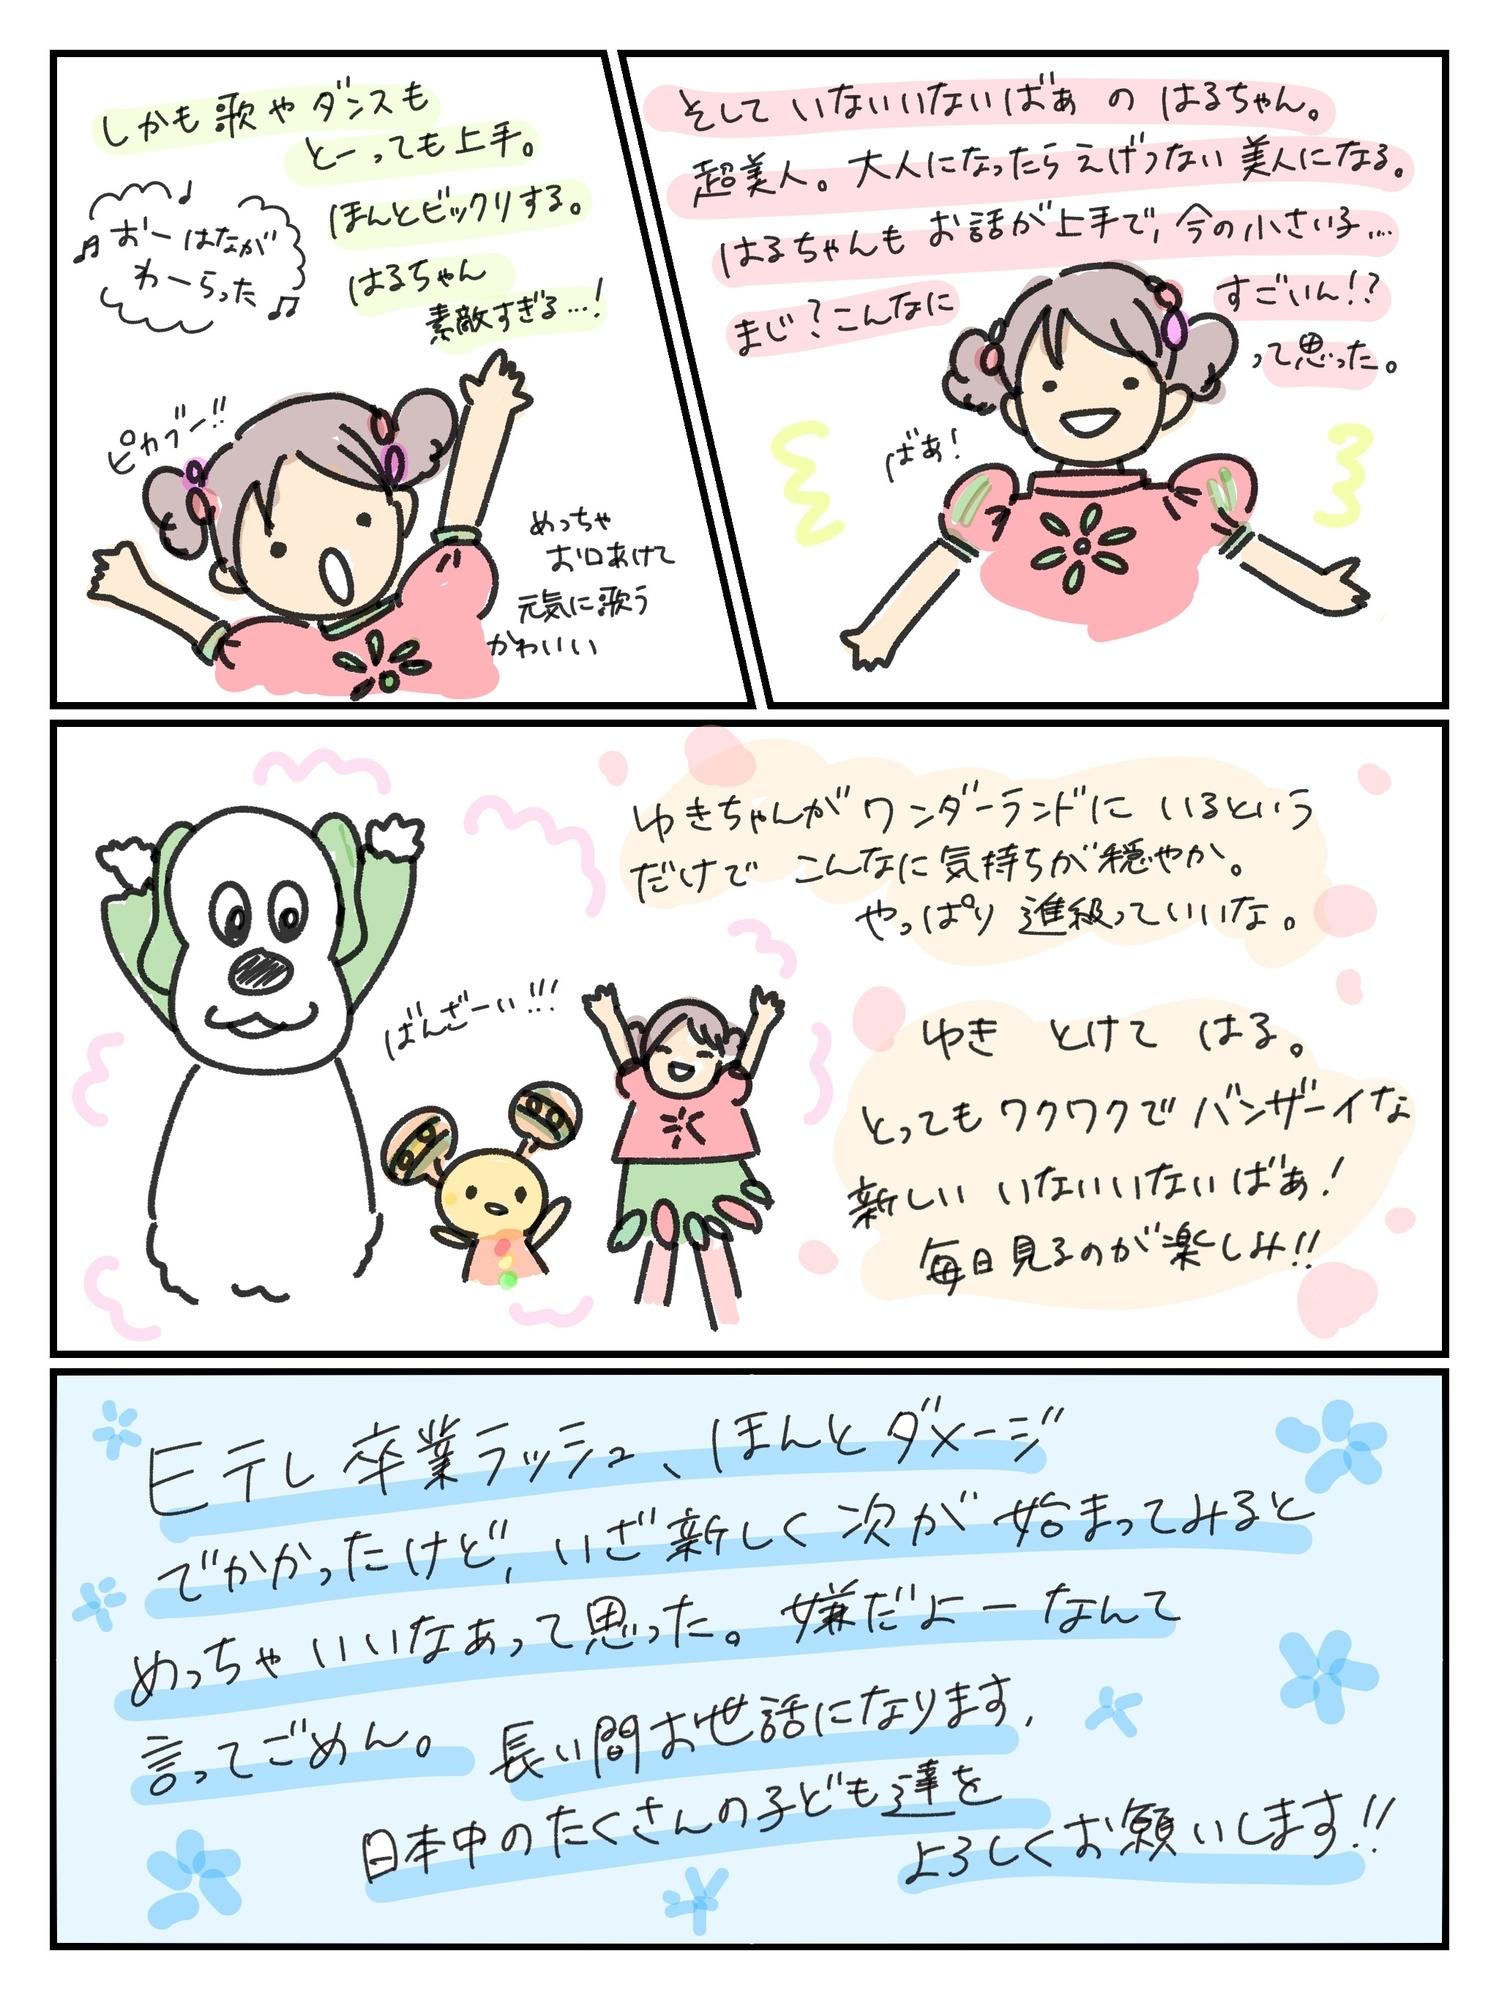 f:id:kinokino-mixtwins:20190506074052j:image